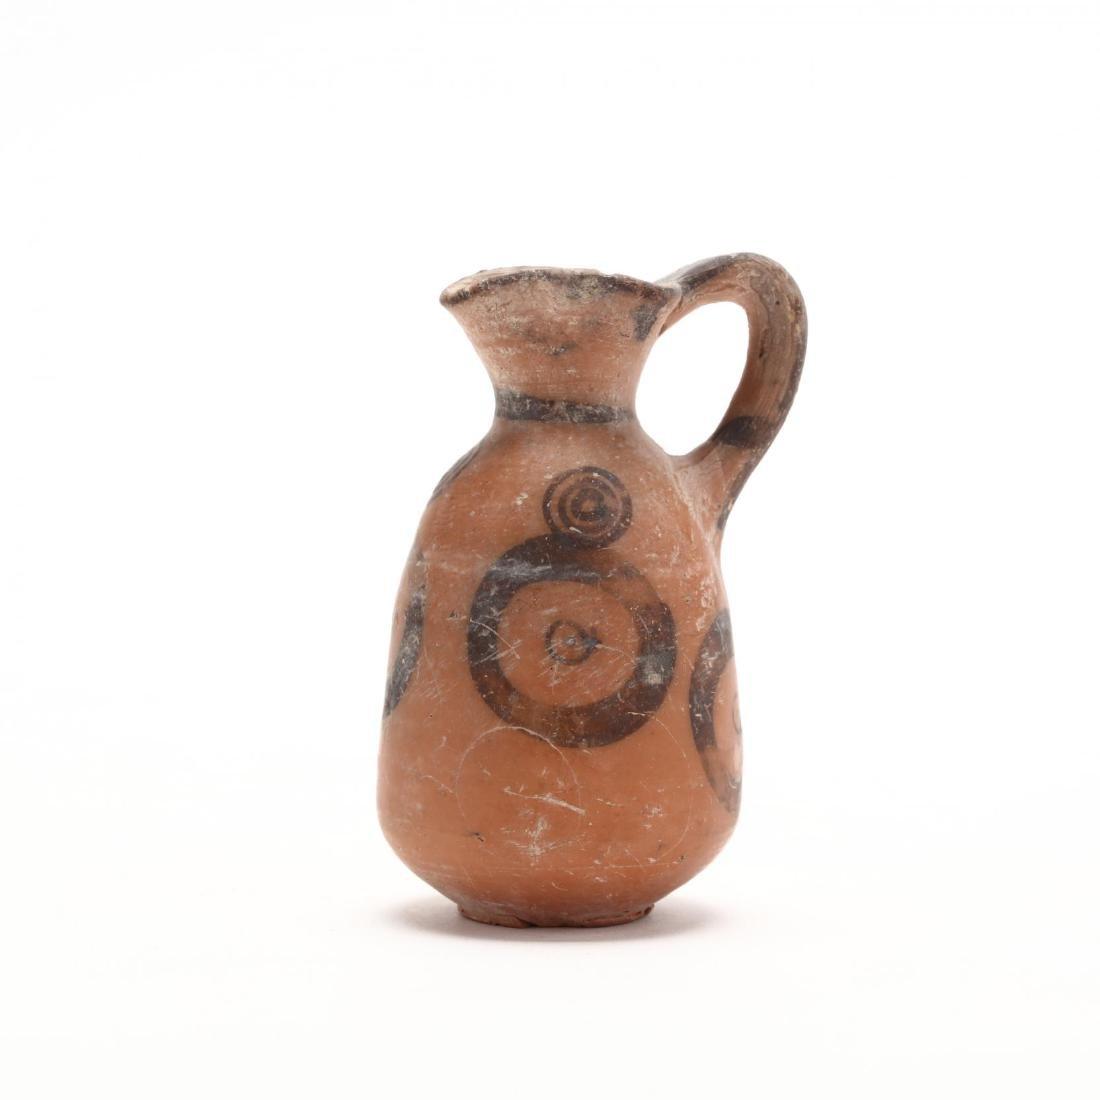 Cypro-Phoenician Iron Age Red Ware Juglet - 3